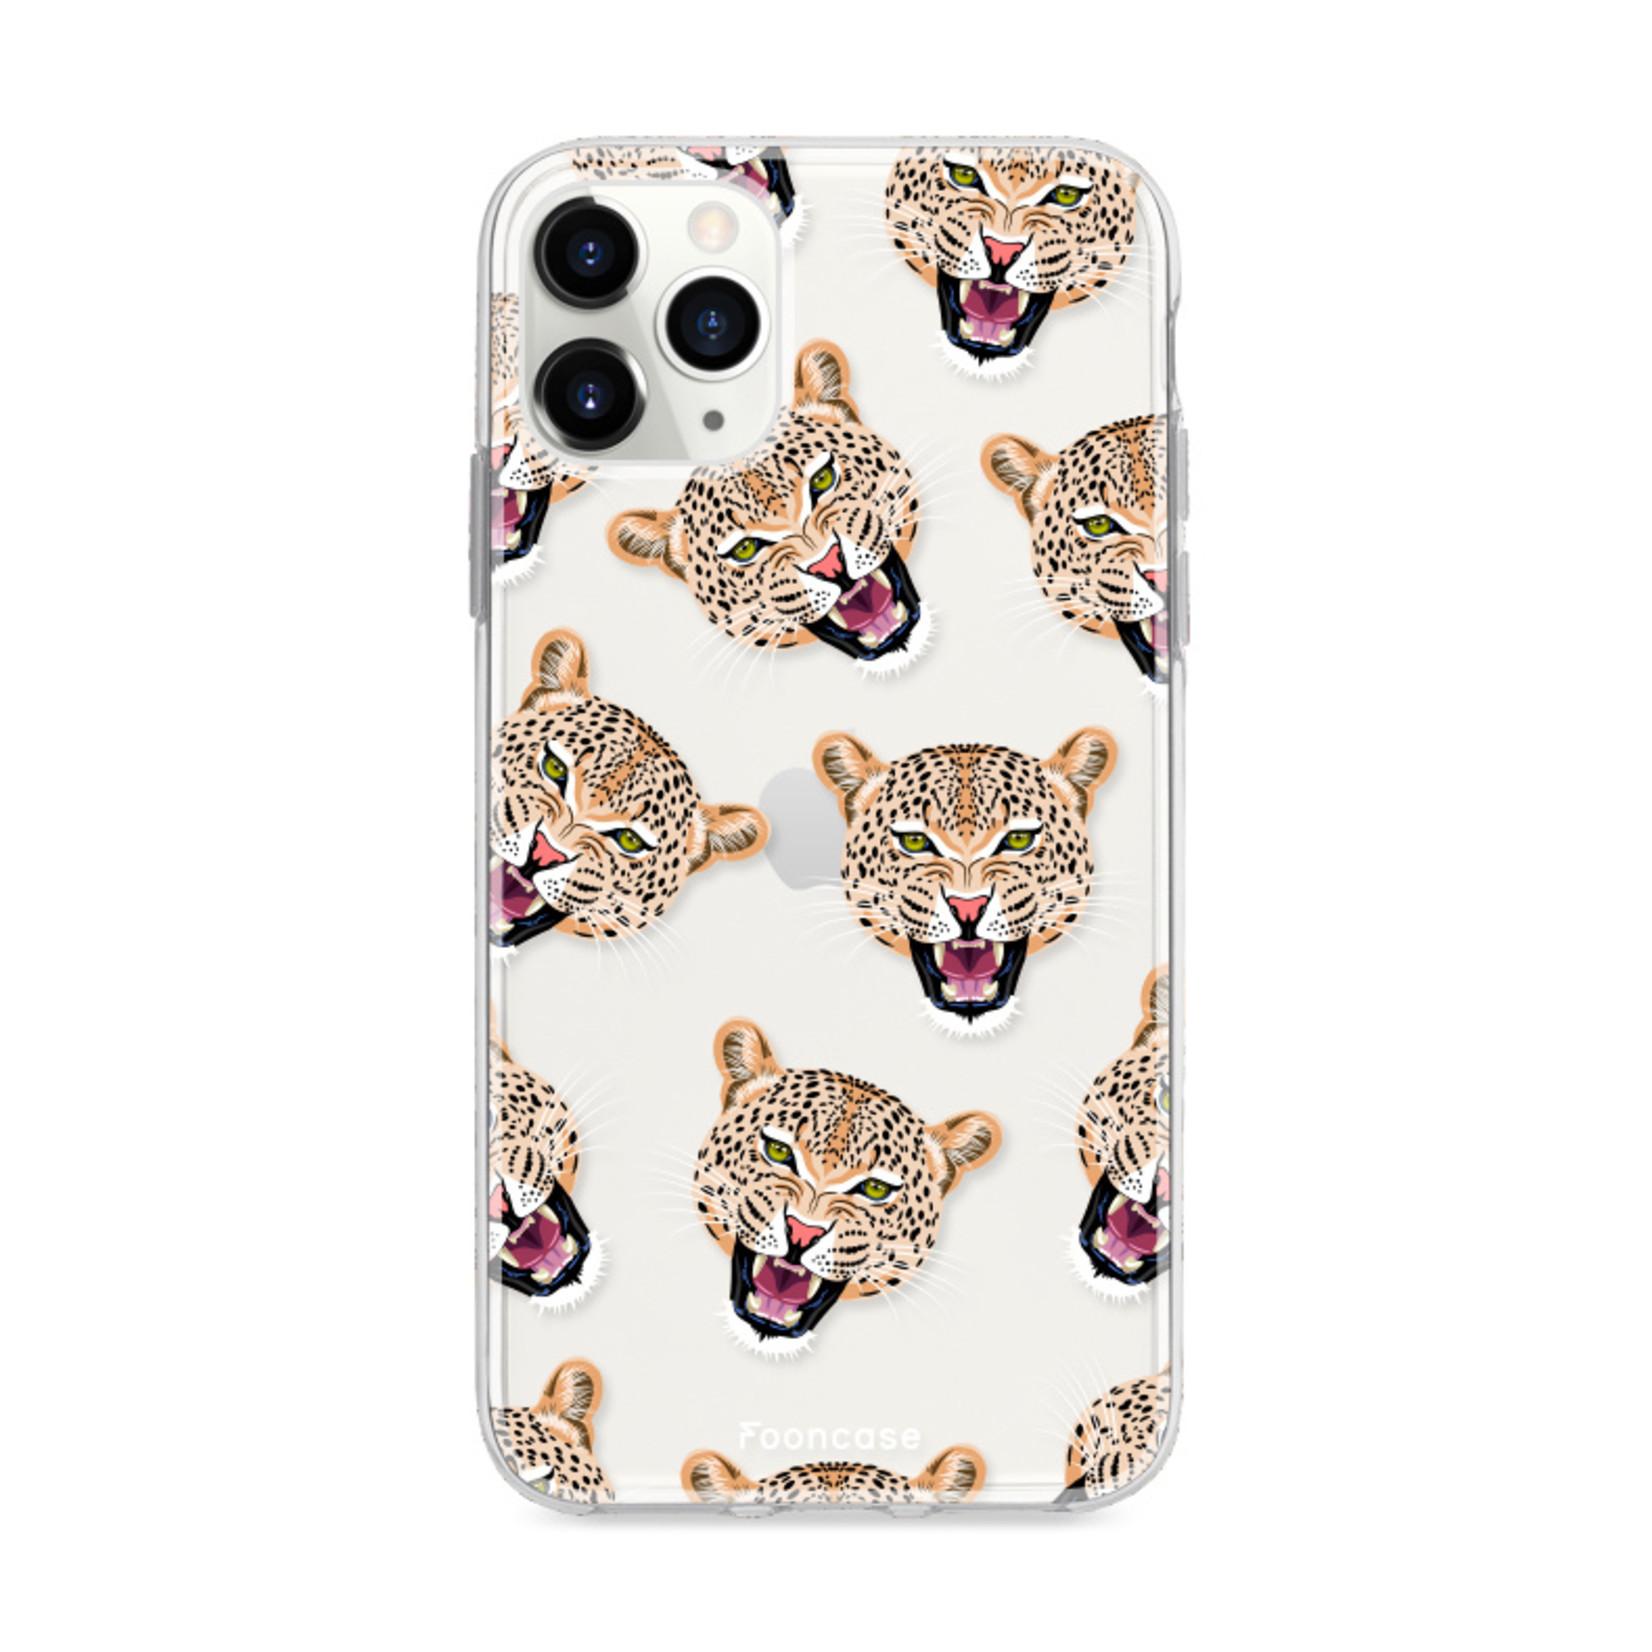 FOONCASE iPhone 11 Pro Max hoesje TPU Soft Case - Back Cover - Cheeky Leopard / Luipaard hoofden